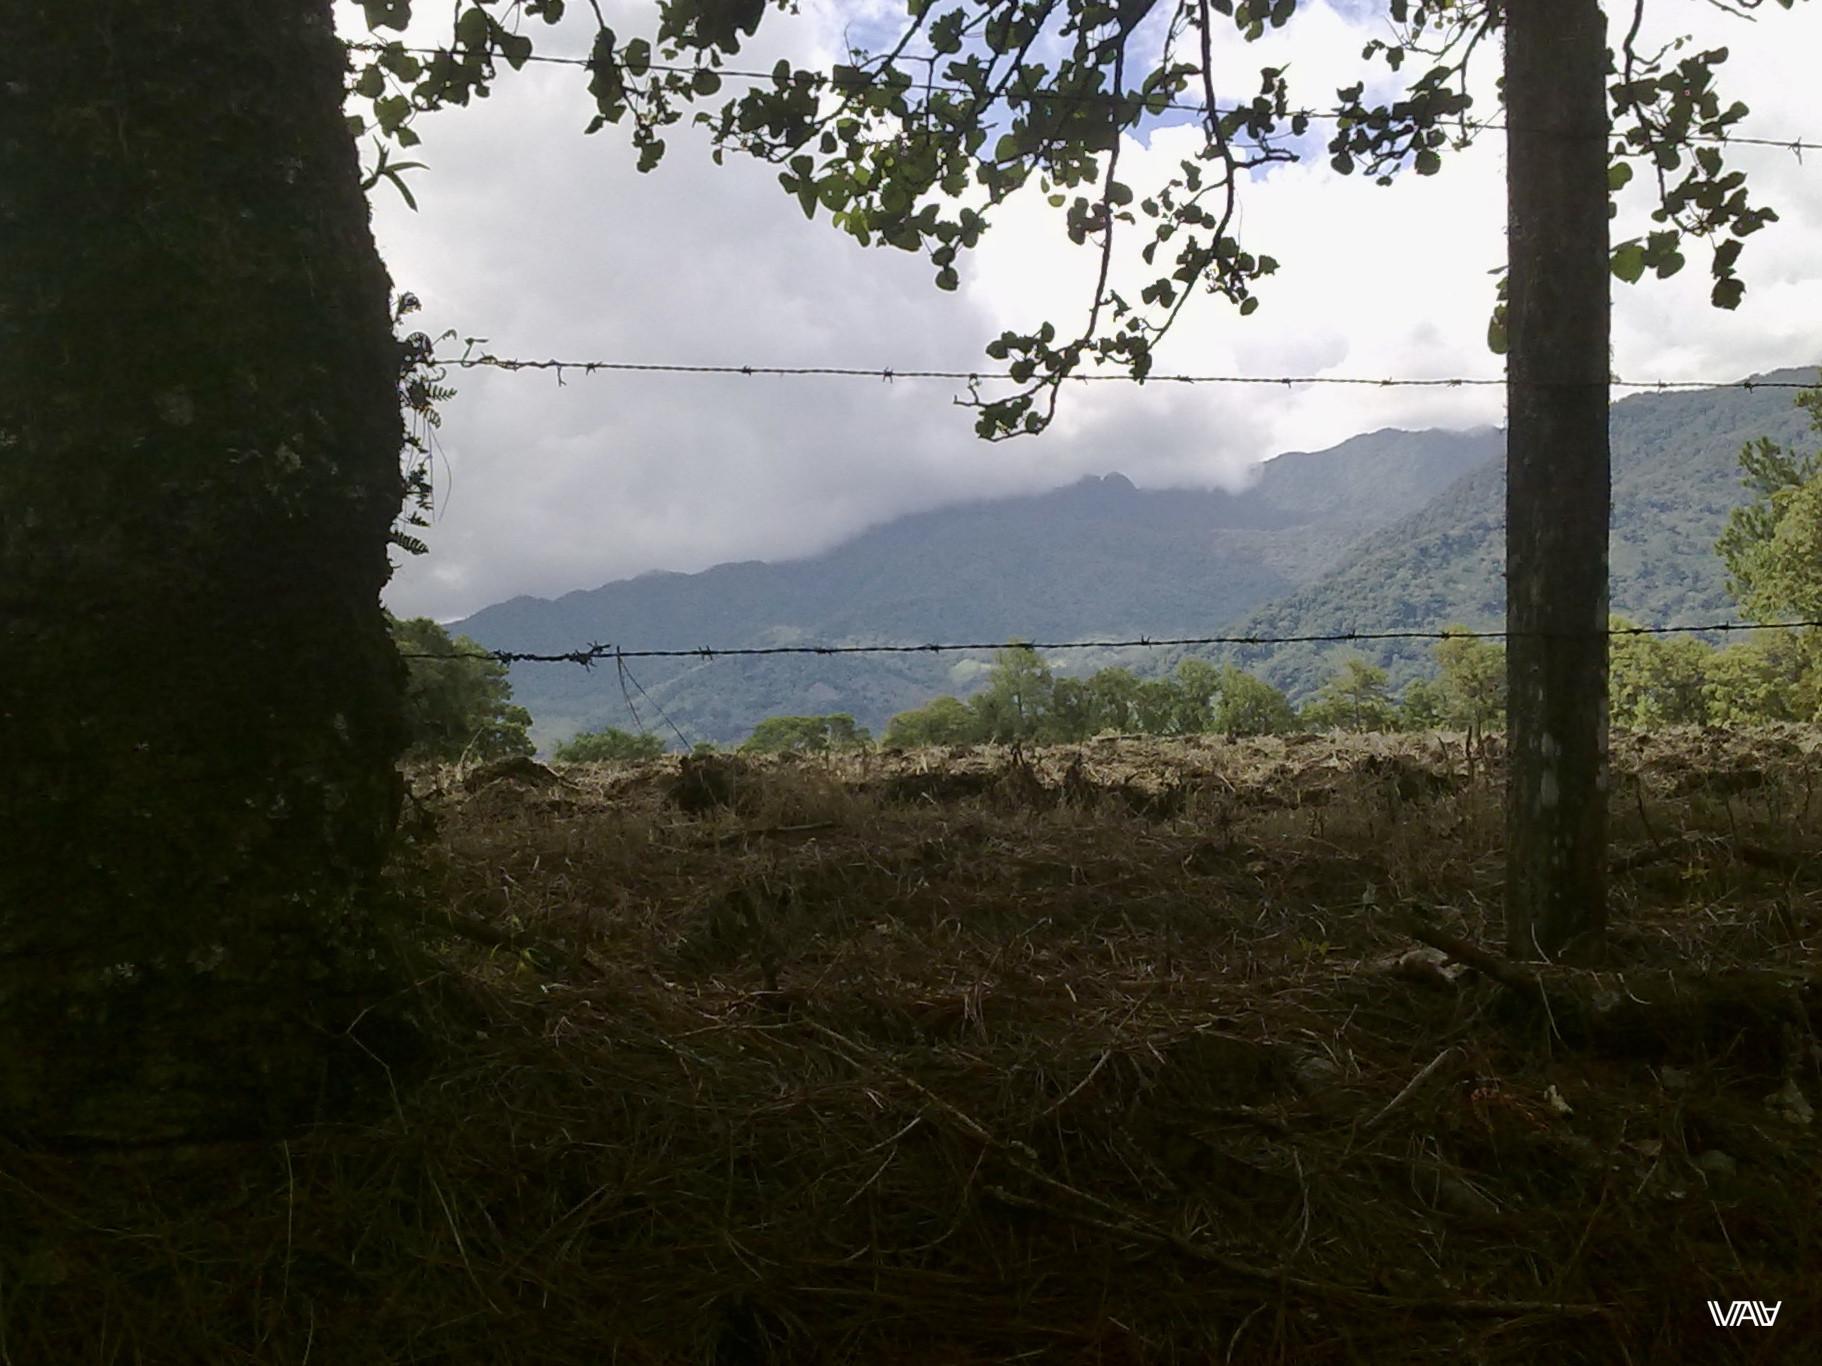 Свобода за колючим забором. Бахо Бокете, Панама